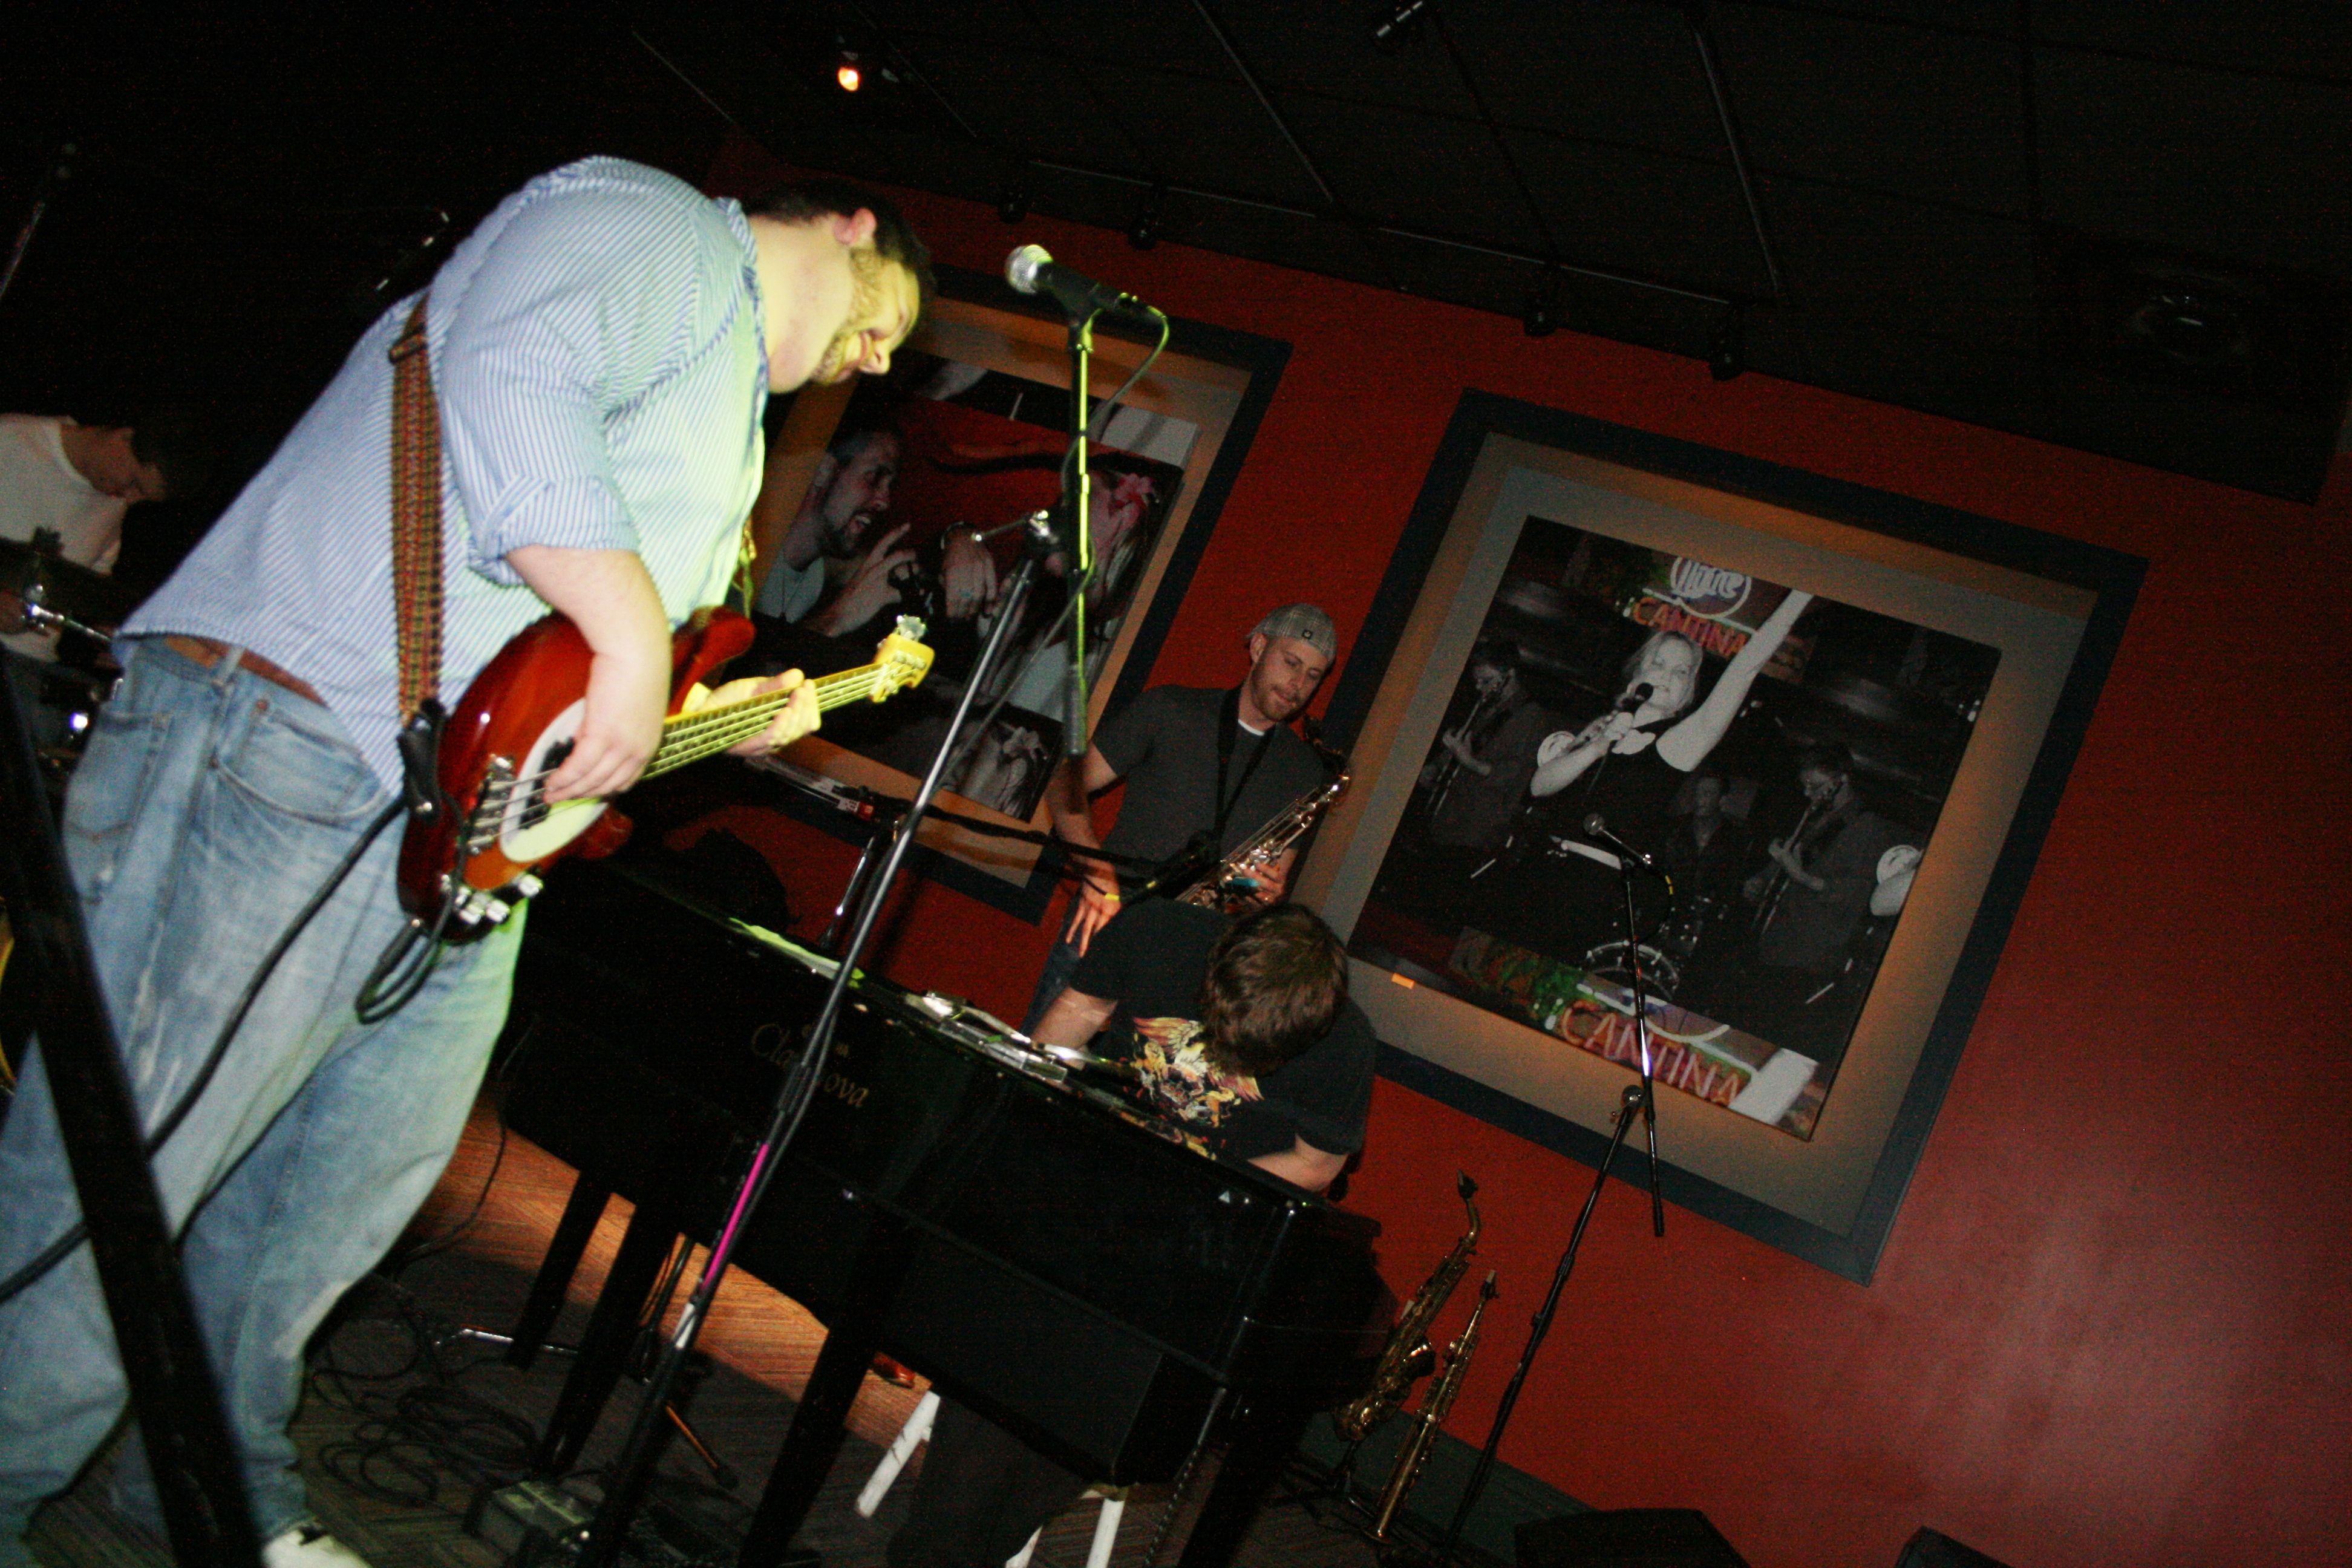 Feb. 5th, 2010 - Gig 316 – The Bank Bar & Grille – Dubuque, IA – 10:00pm-1:30am